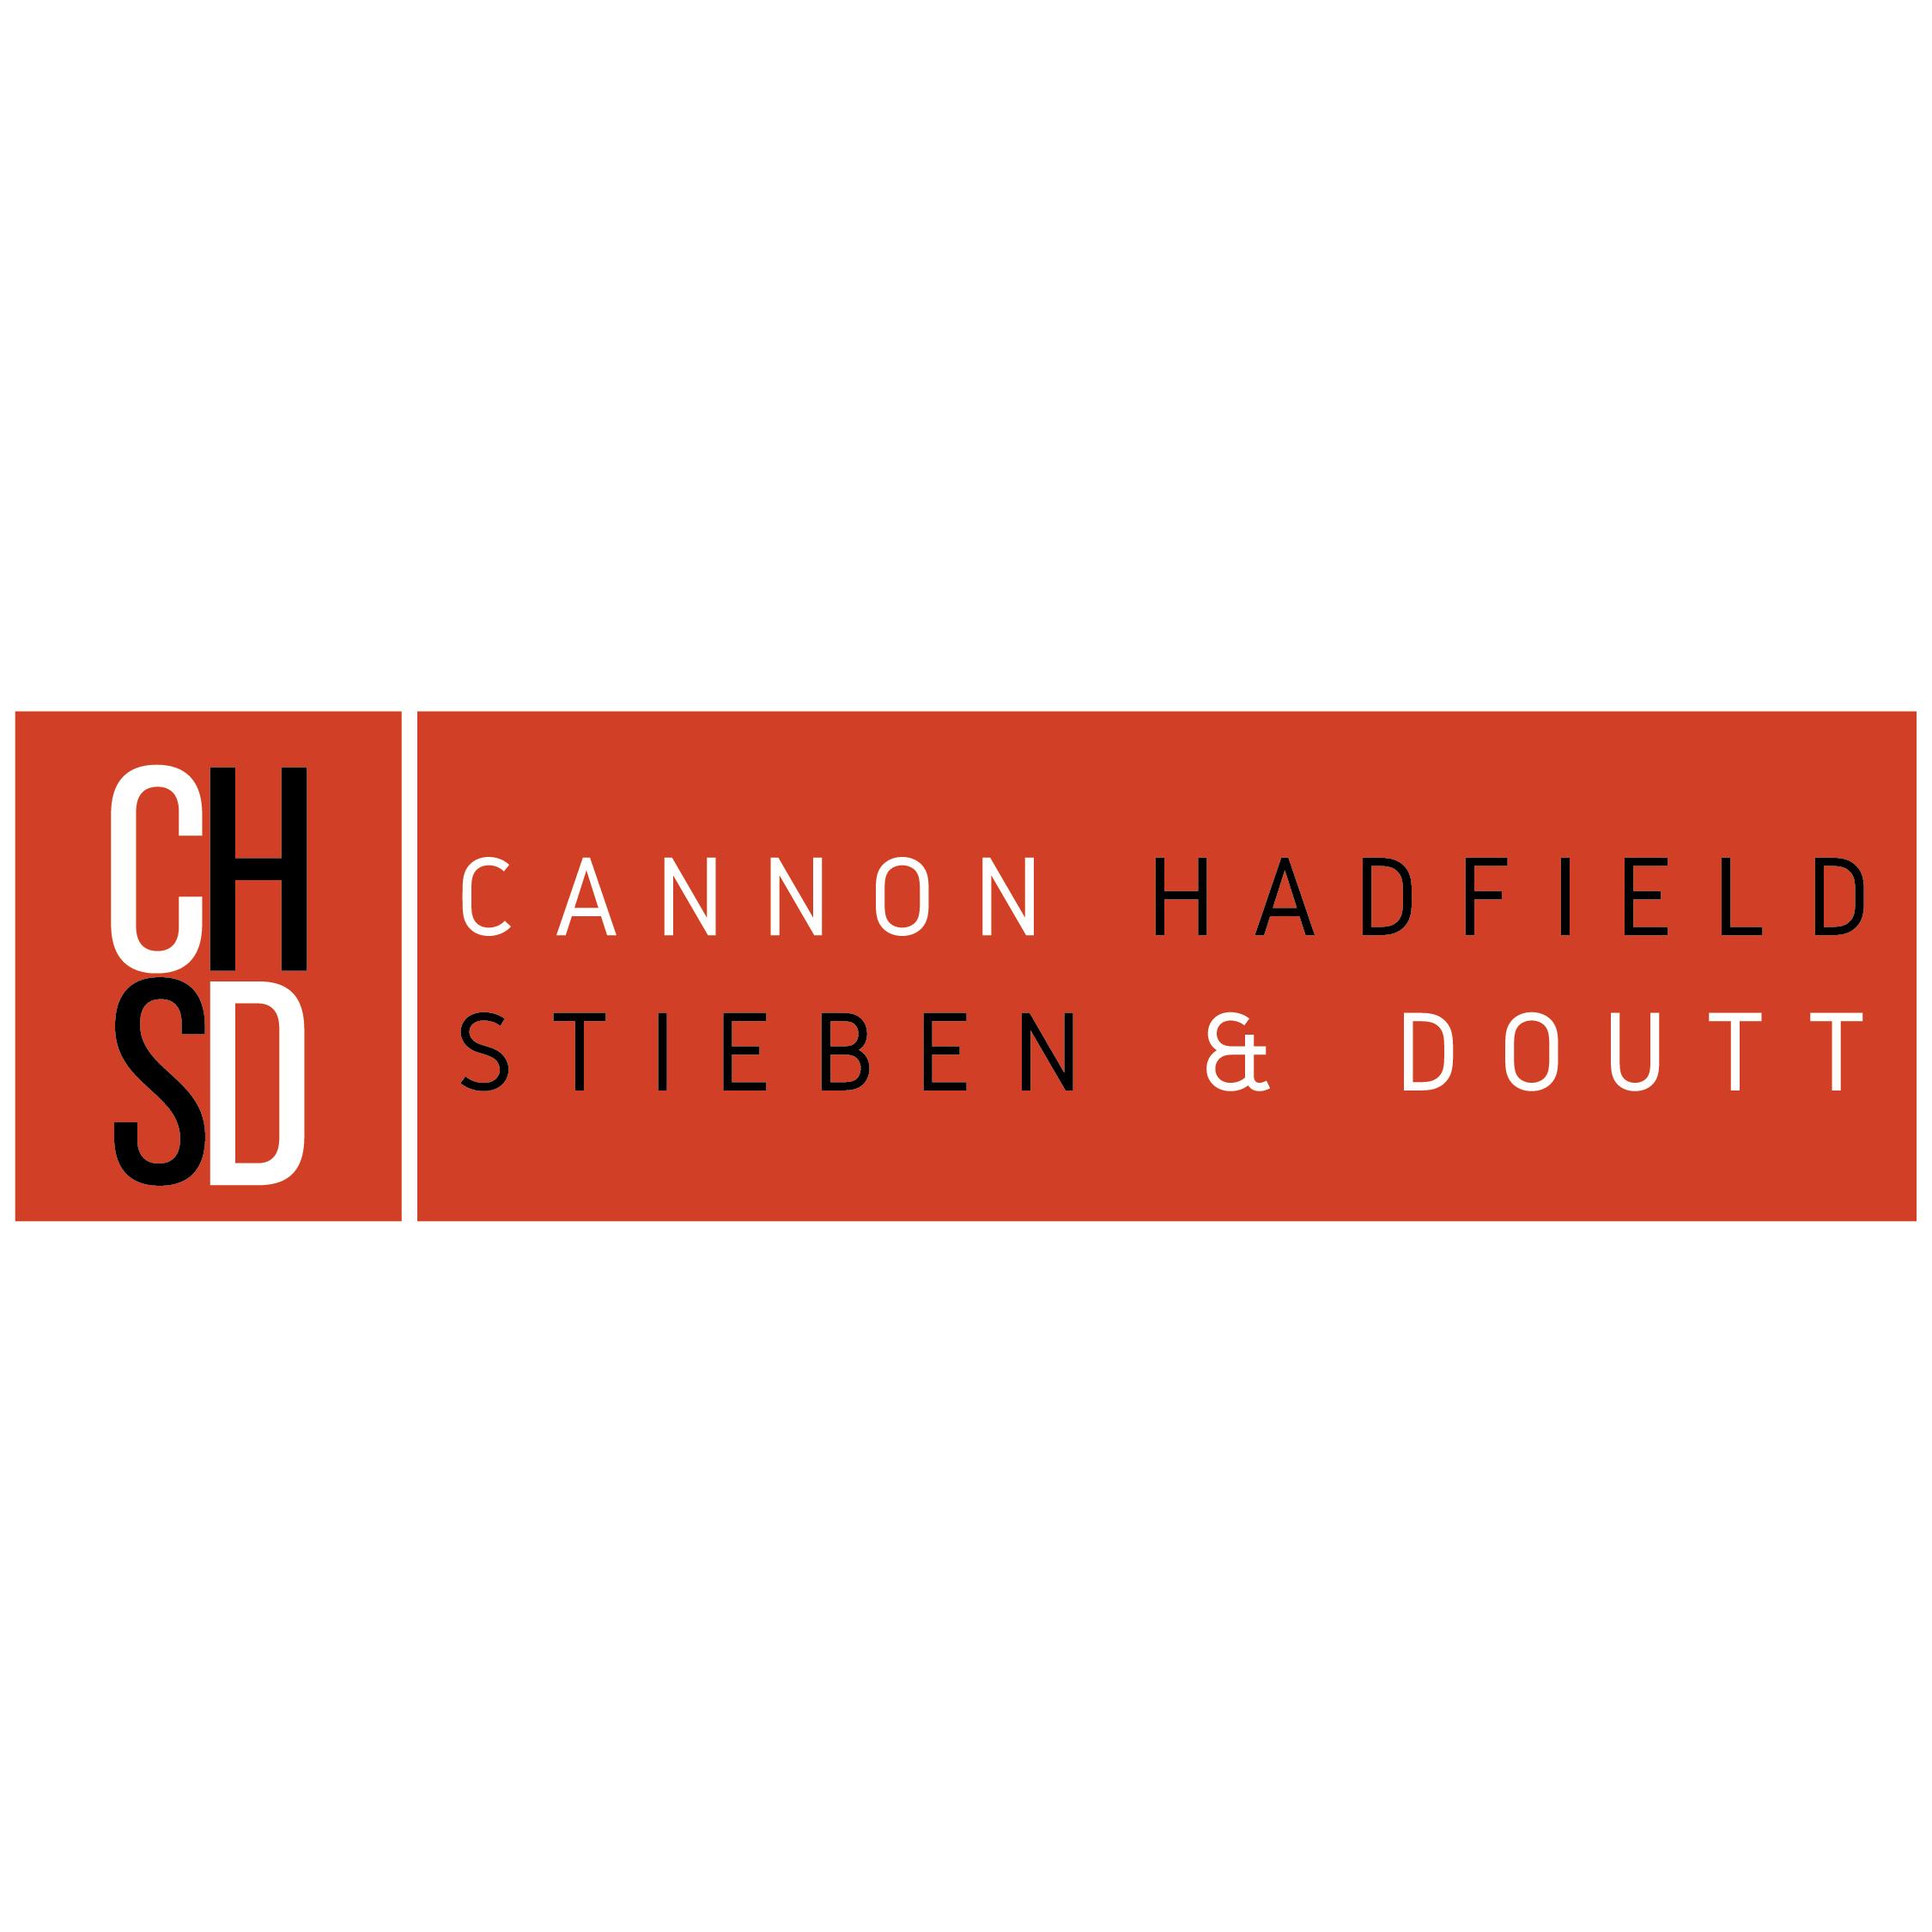 Cannon Hadfield Stieben & Doutt, LLC